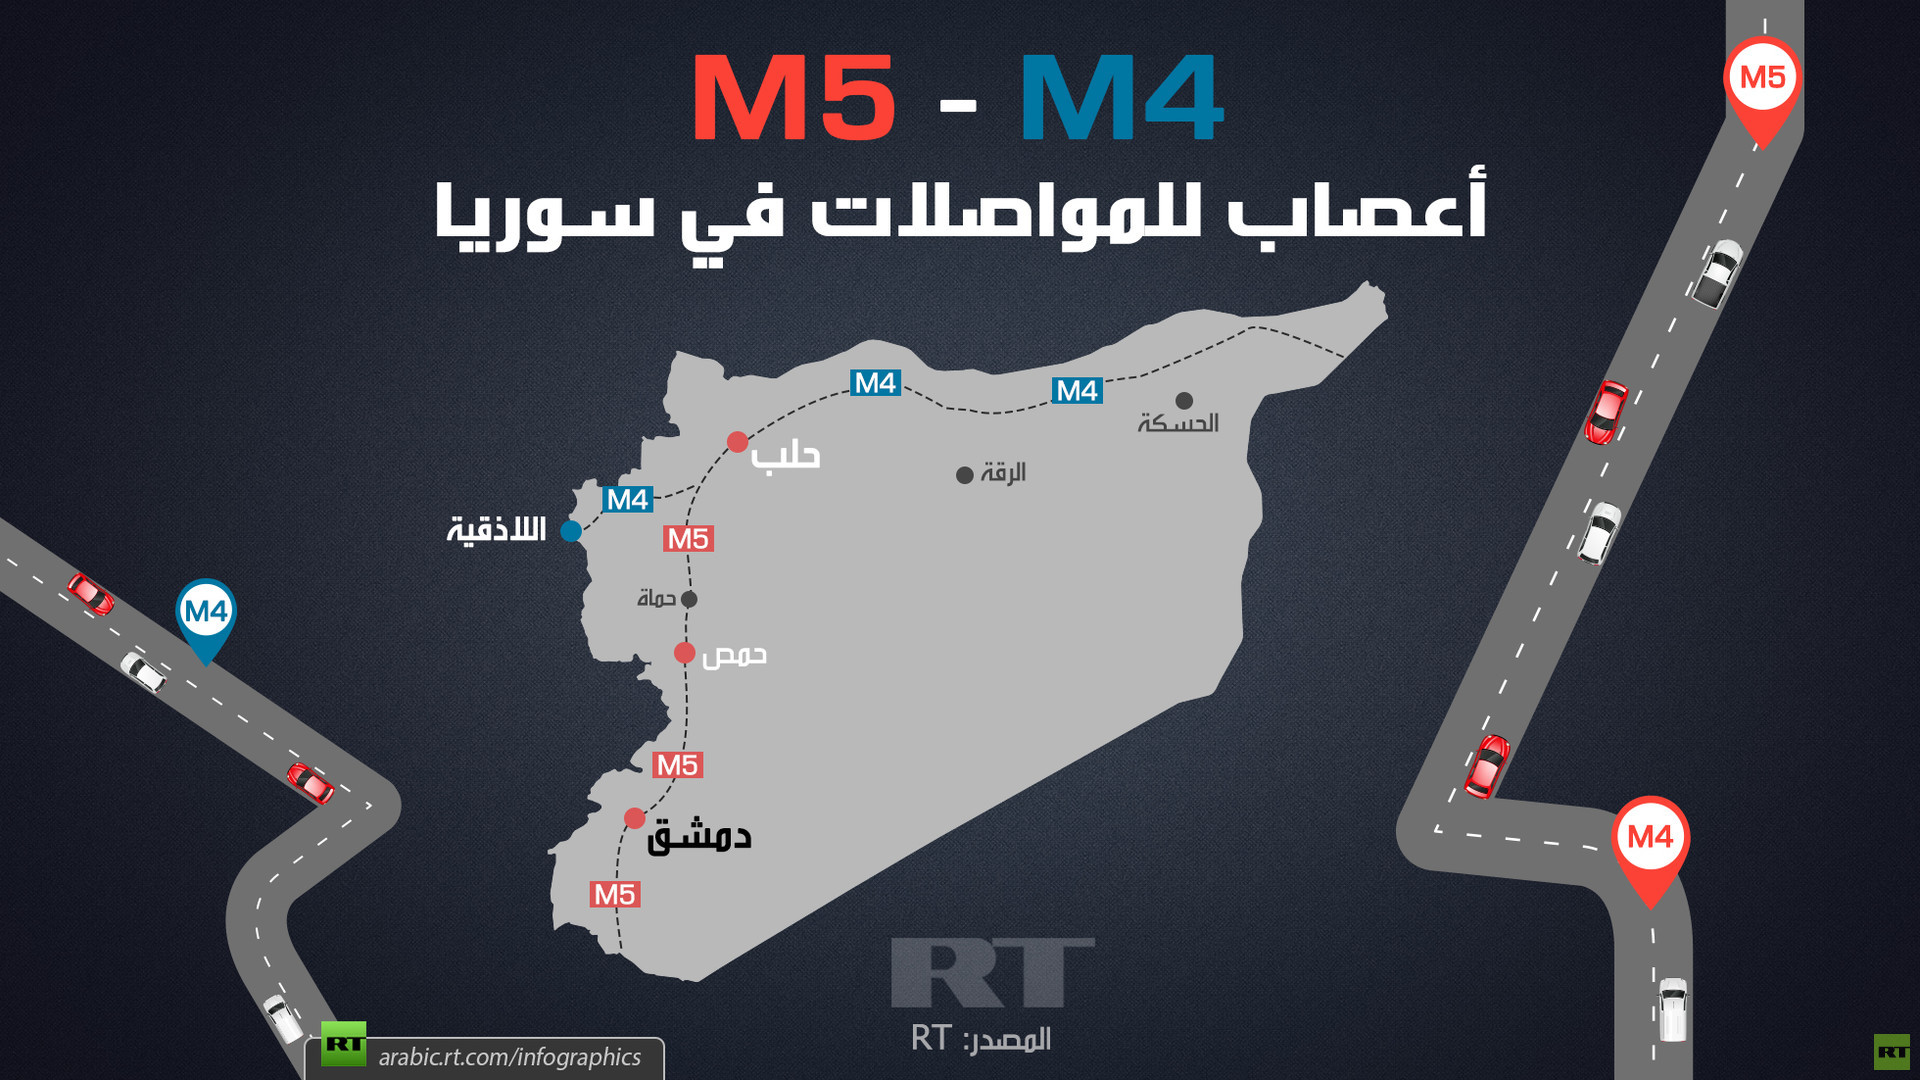 M4 وM5 أعصاب للمواصلات في سوريا